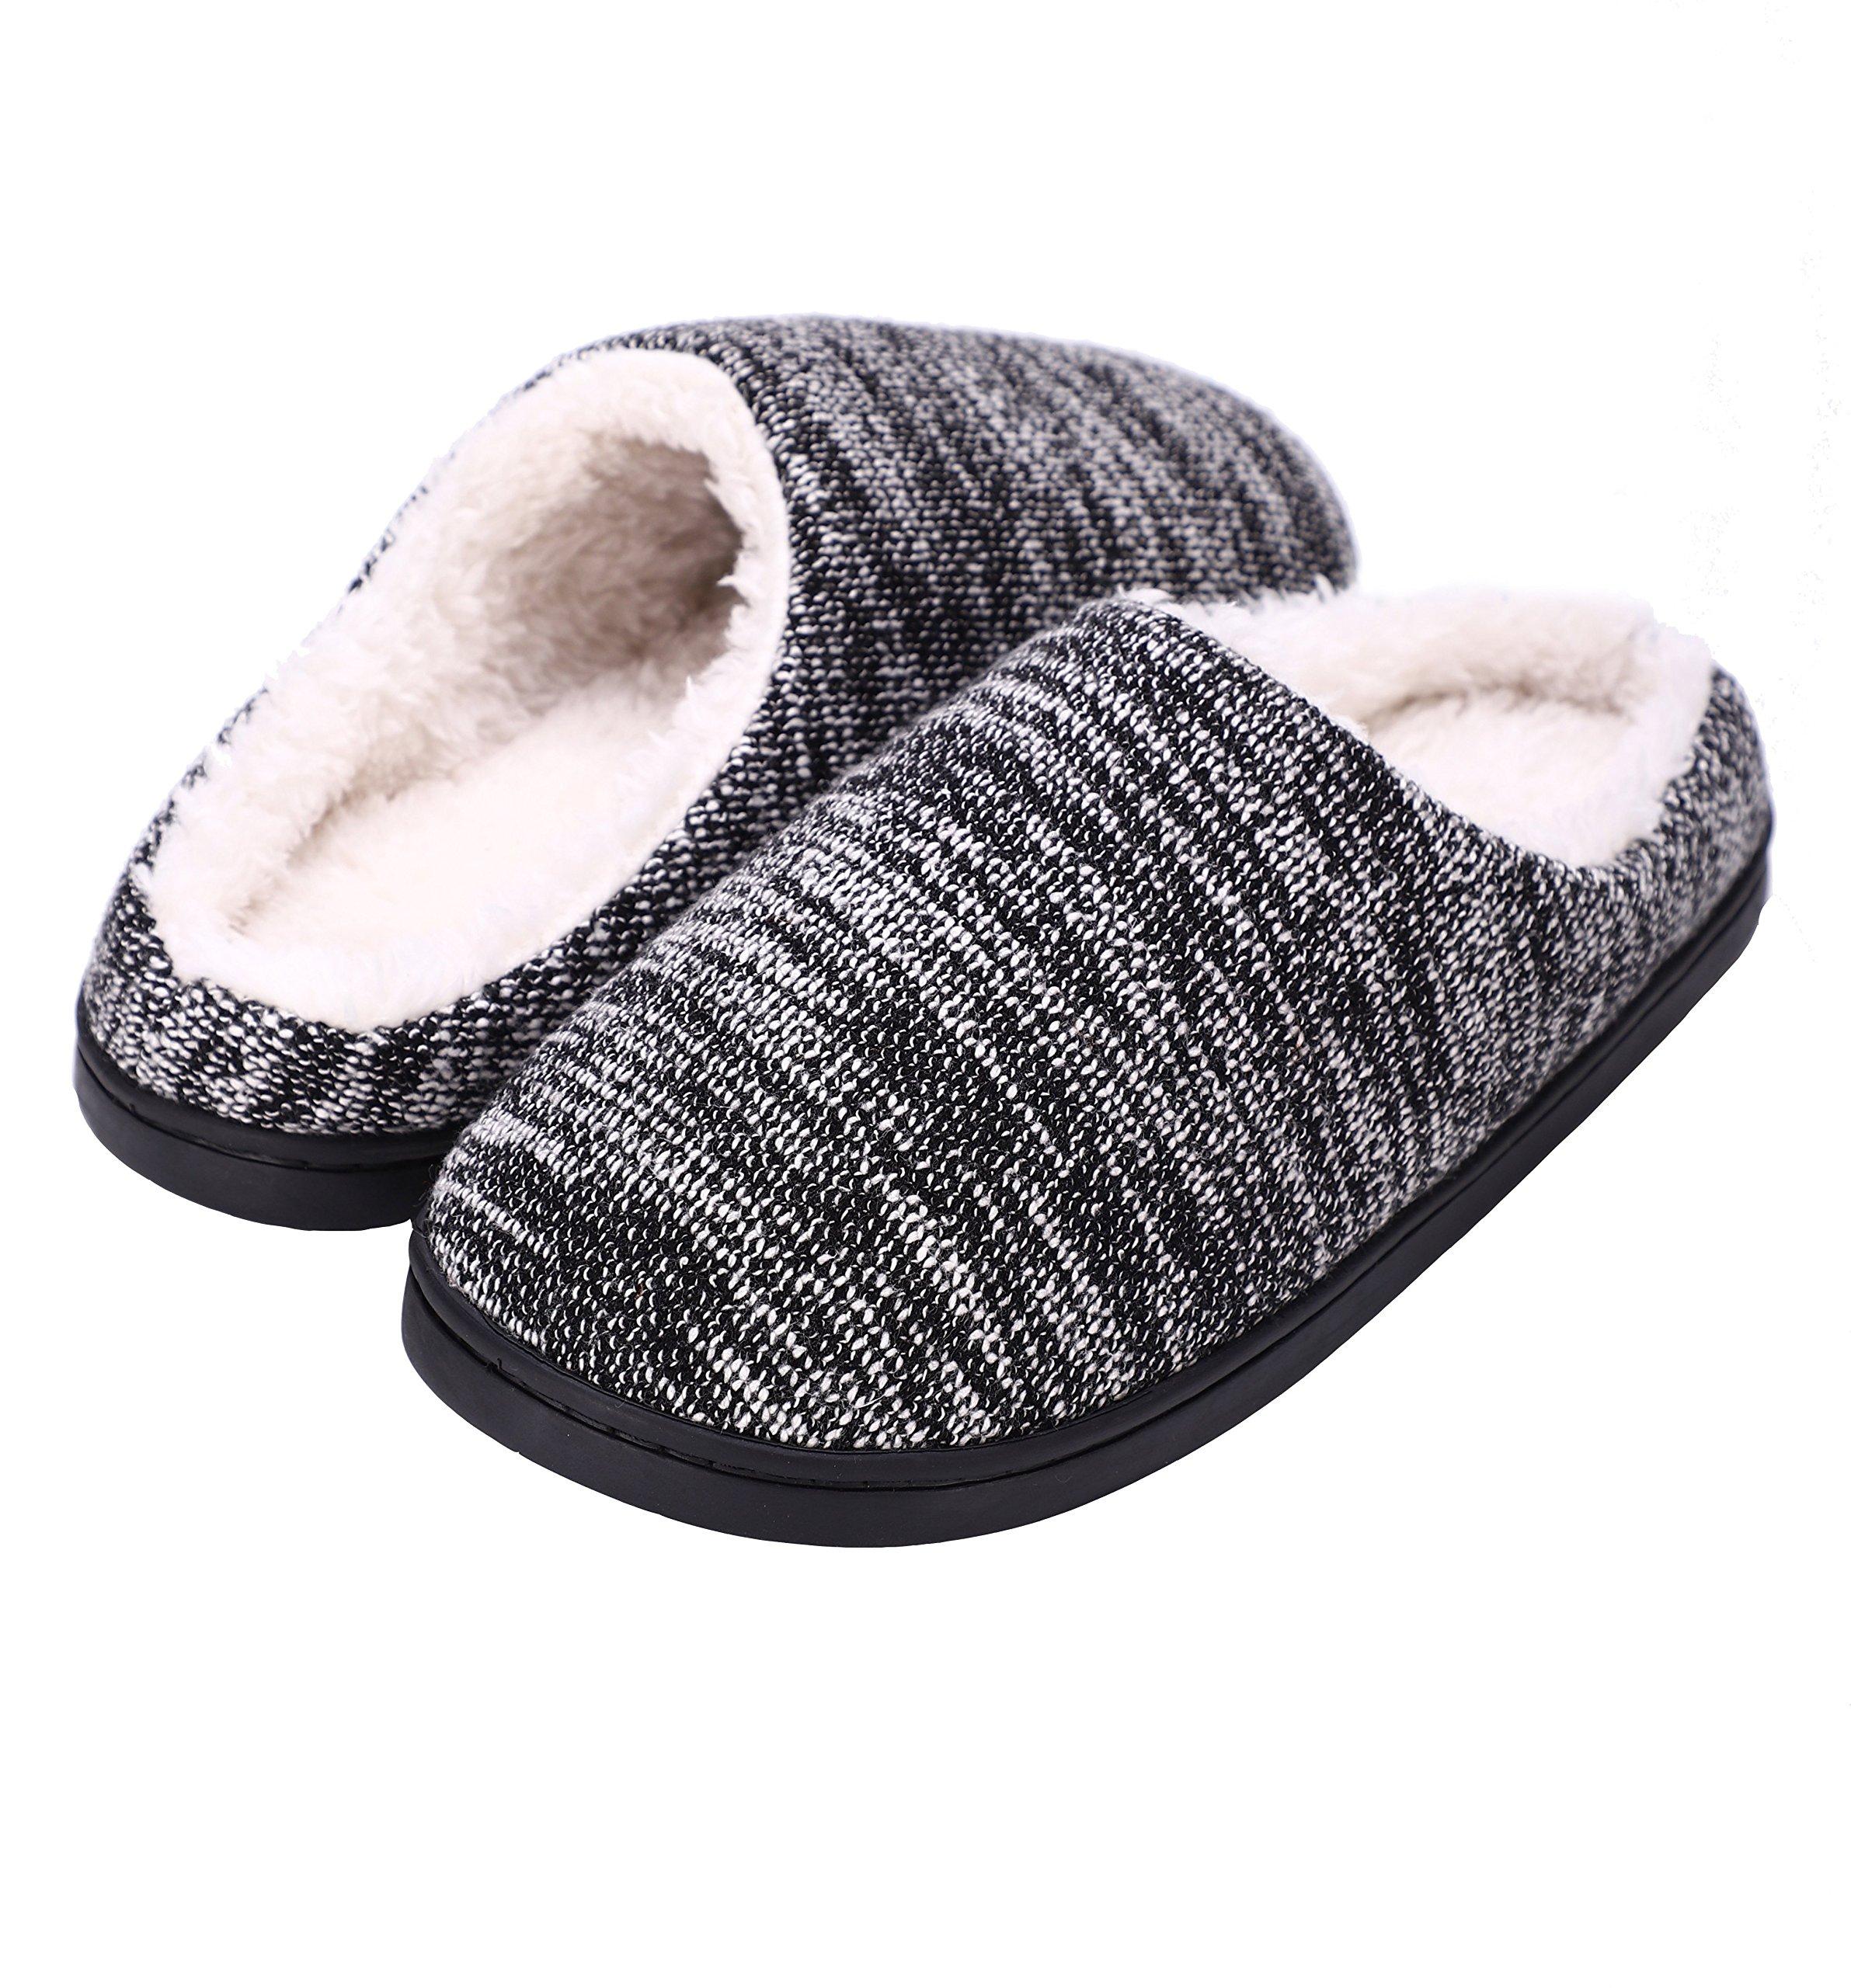 DRSLPAR Women's Memory Foam Slippers Cozy Clog Fuzzy Indoor House Shoes Anti Slip Ruber Sole (Black-White Small) by DRSLPAR